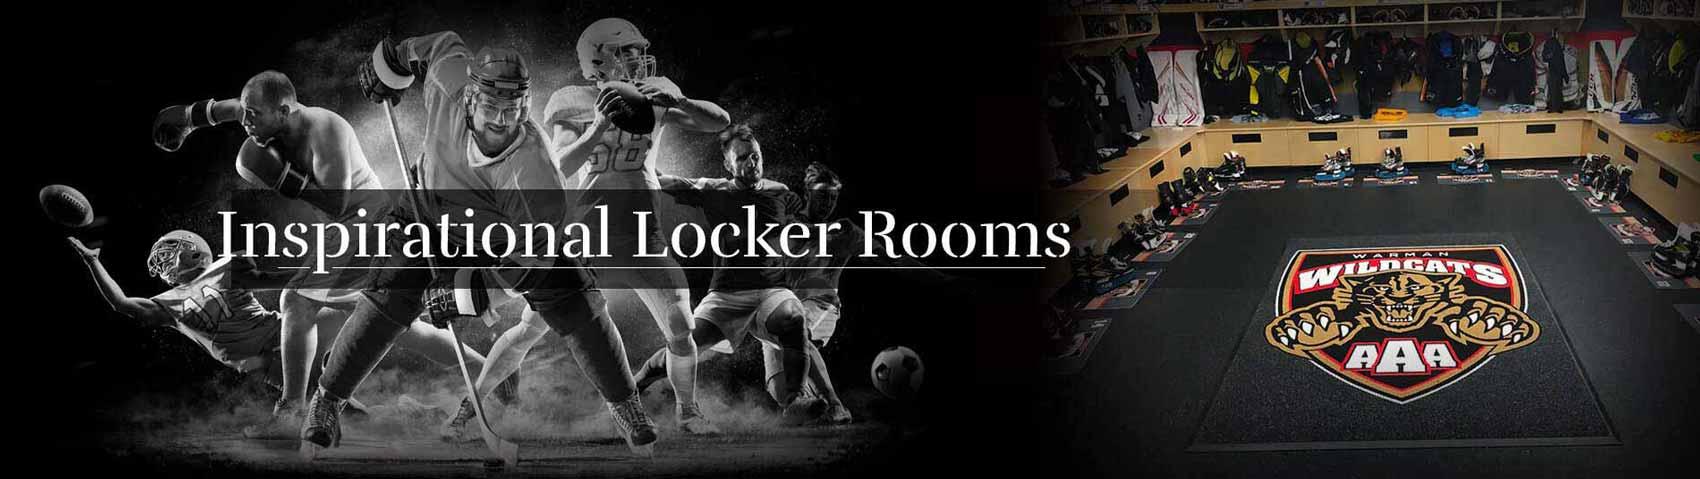 3 Inspirational Locker Rooms banner